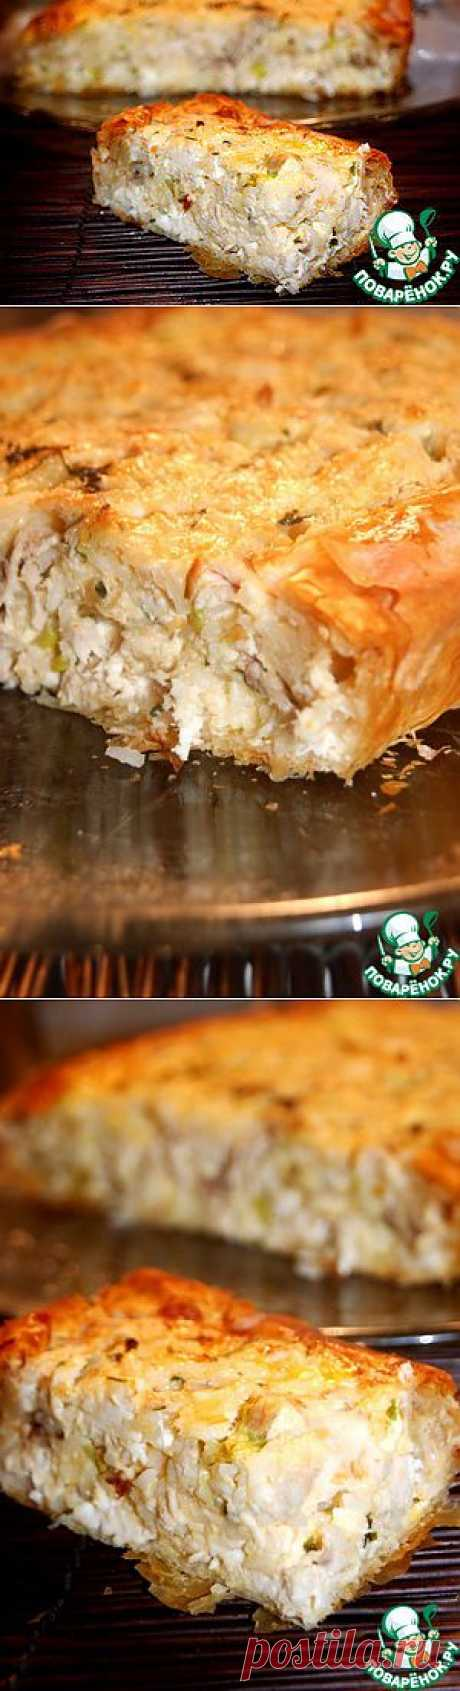 The Greek rural chicken pie - the culinary recipe